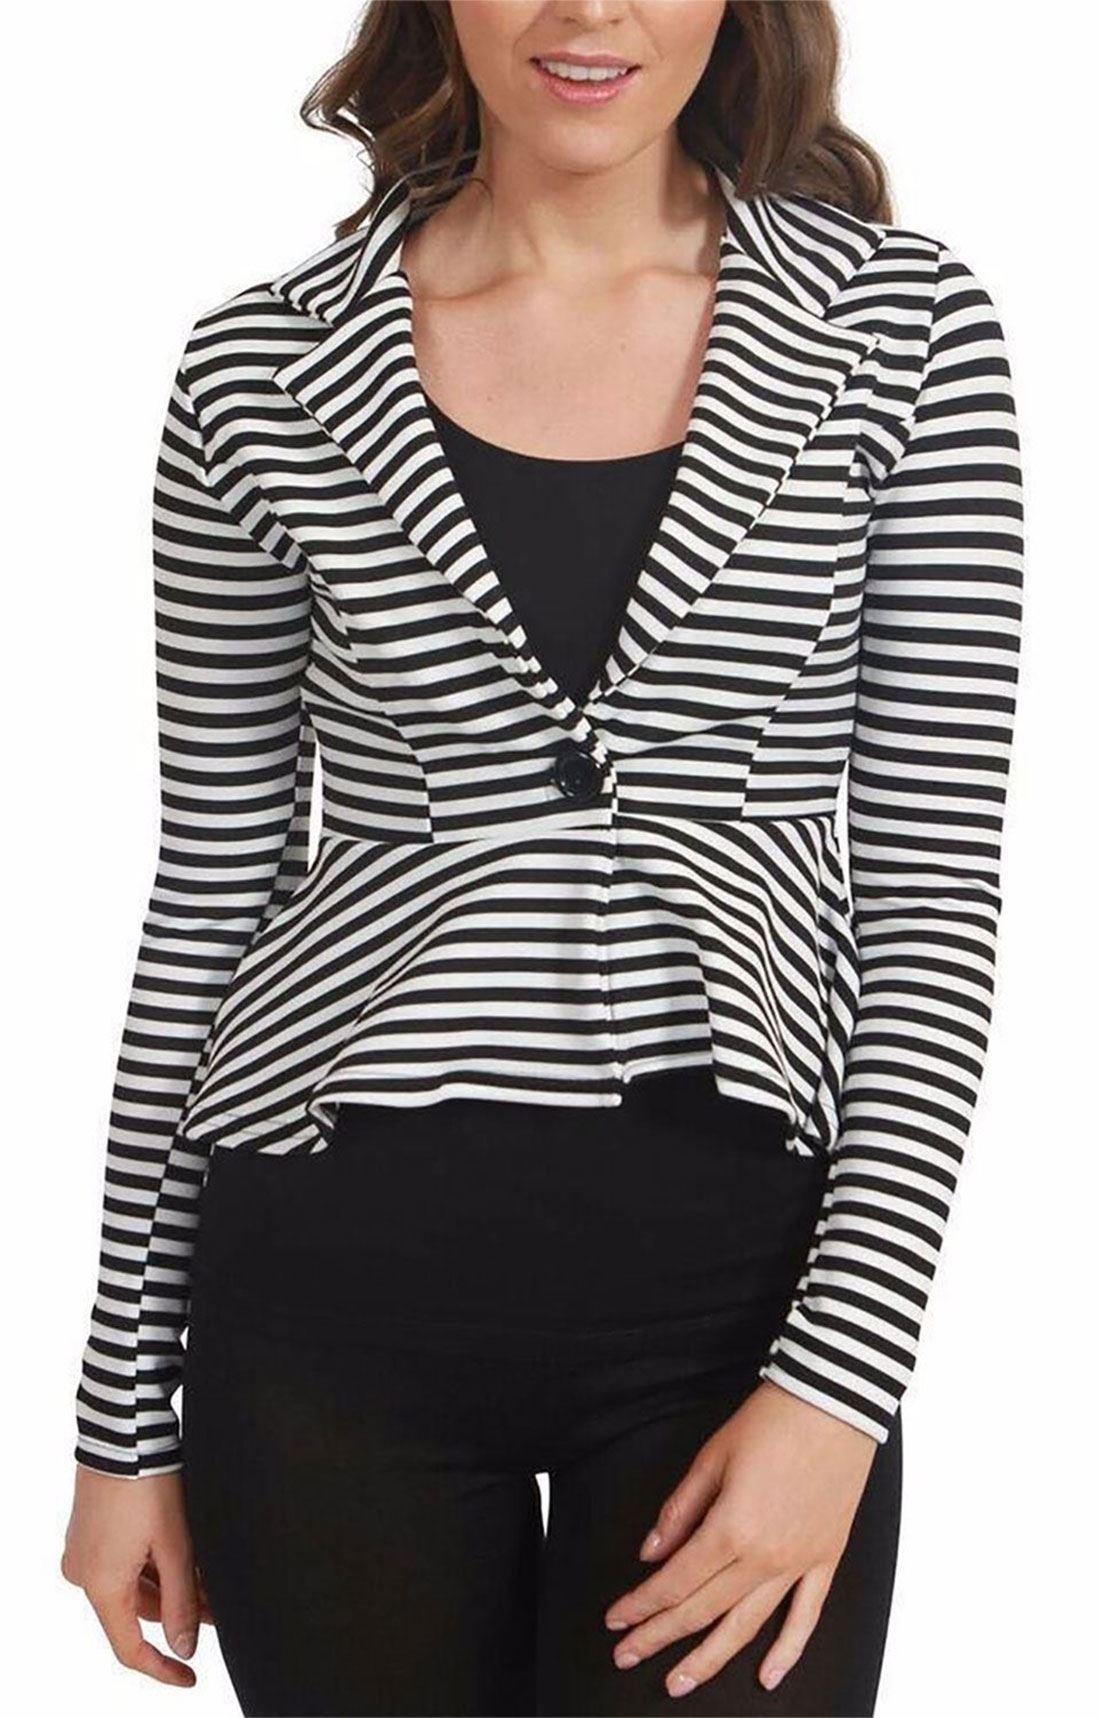 Ladies Slim Fit Striped Jacket Womens Long Sleeve One Button Peplum Blazer Coat#(Black And White Stripe Printed Peplum Blazer Coat#UK 12-14#Womens)